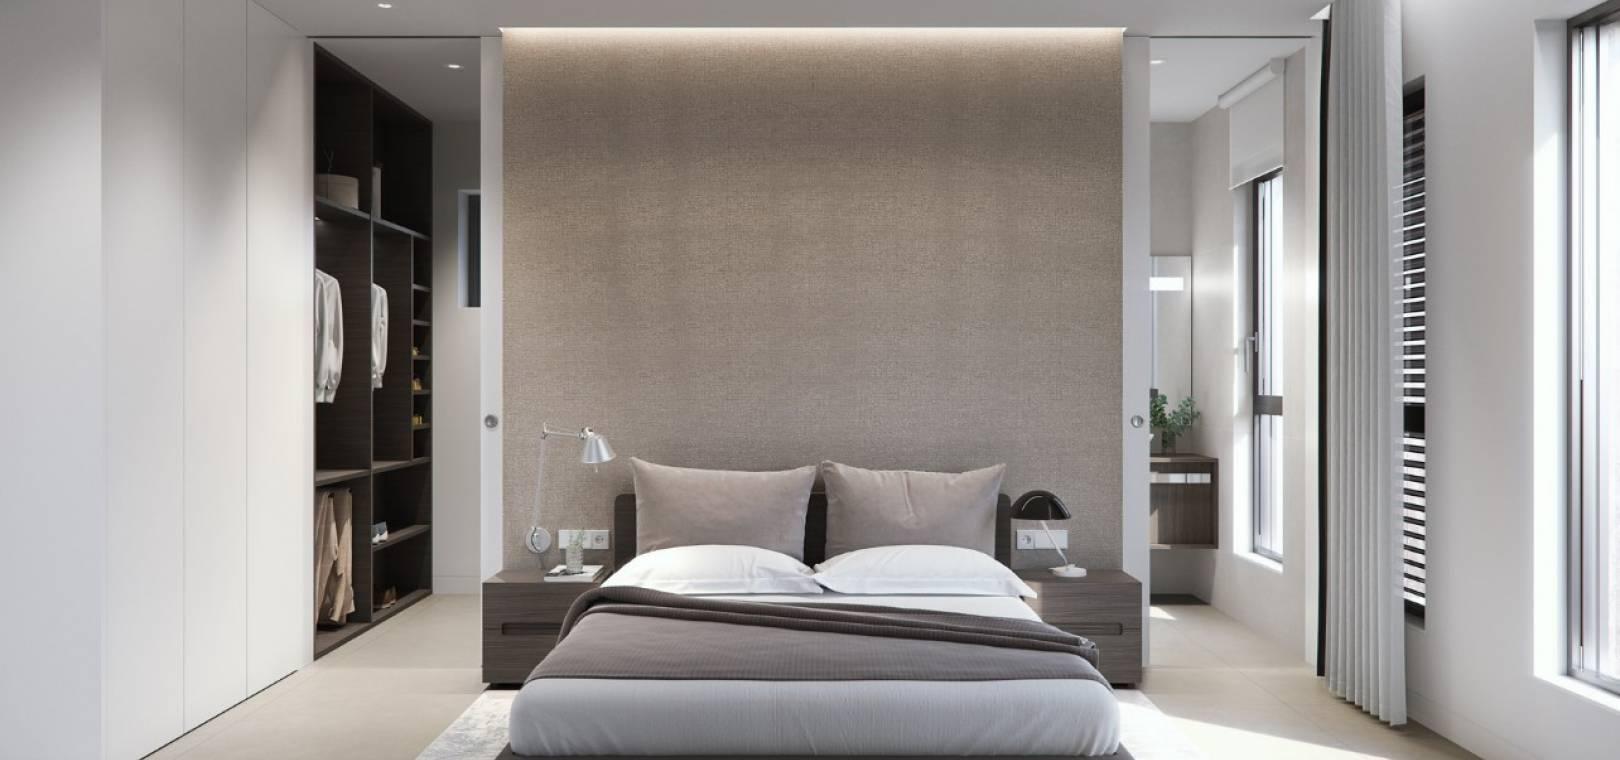 Torre_de_la_Horadada_New_Build_Luxury_Houses_For_Sale_nsp256_15